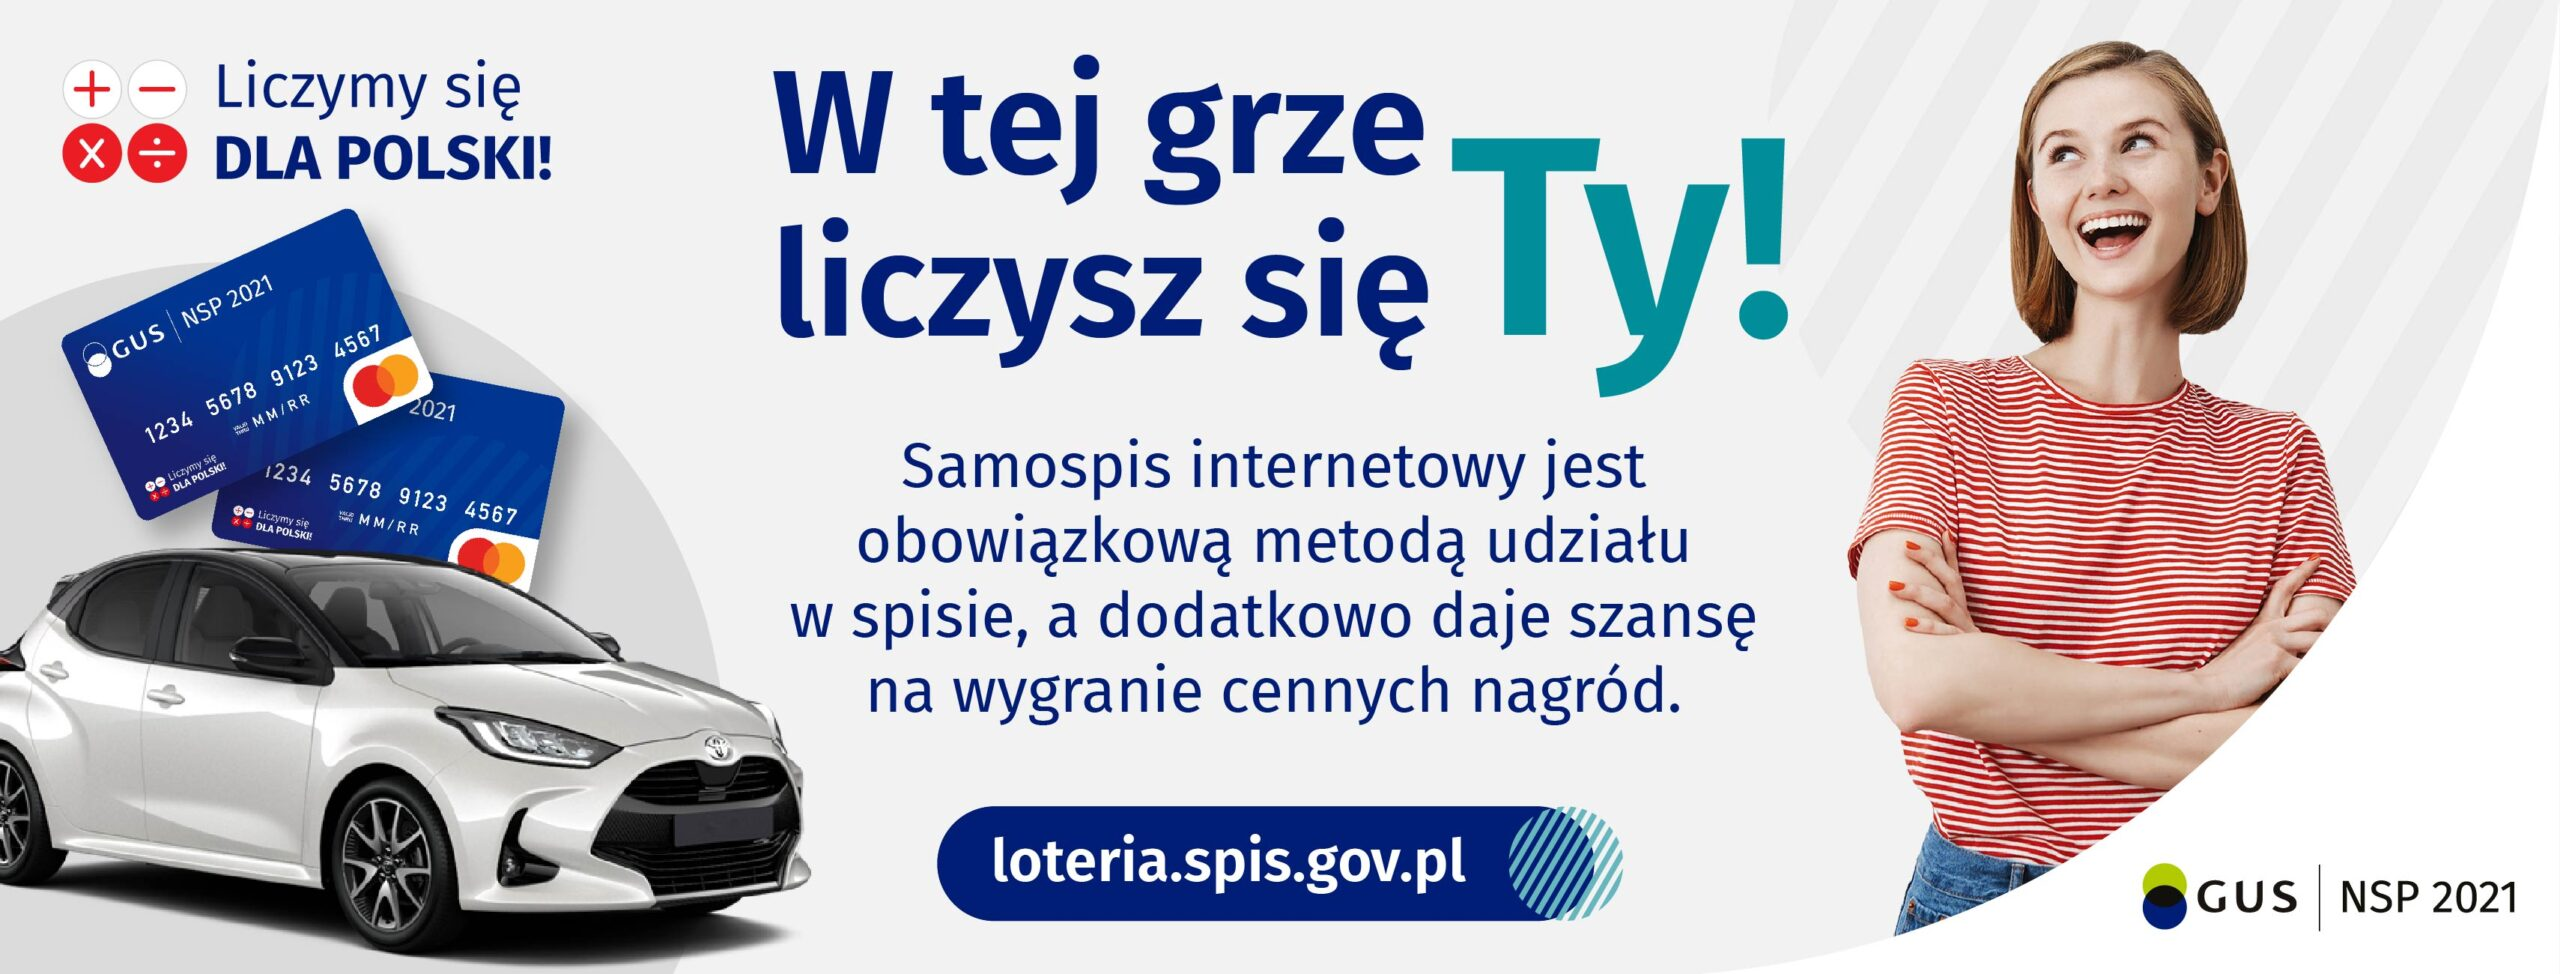 plakat loterii promujący spis powszechny